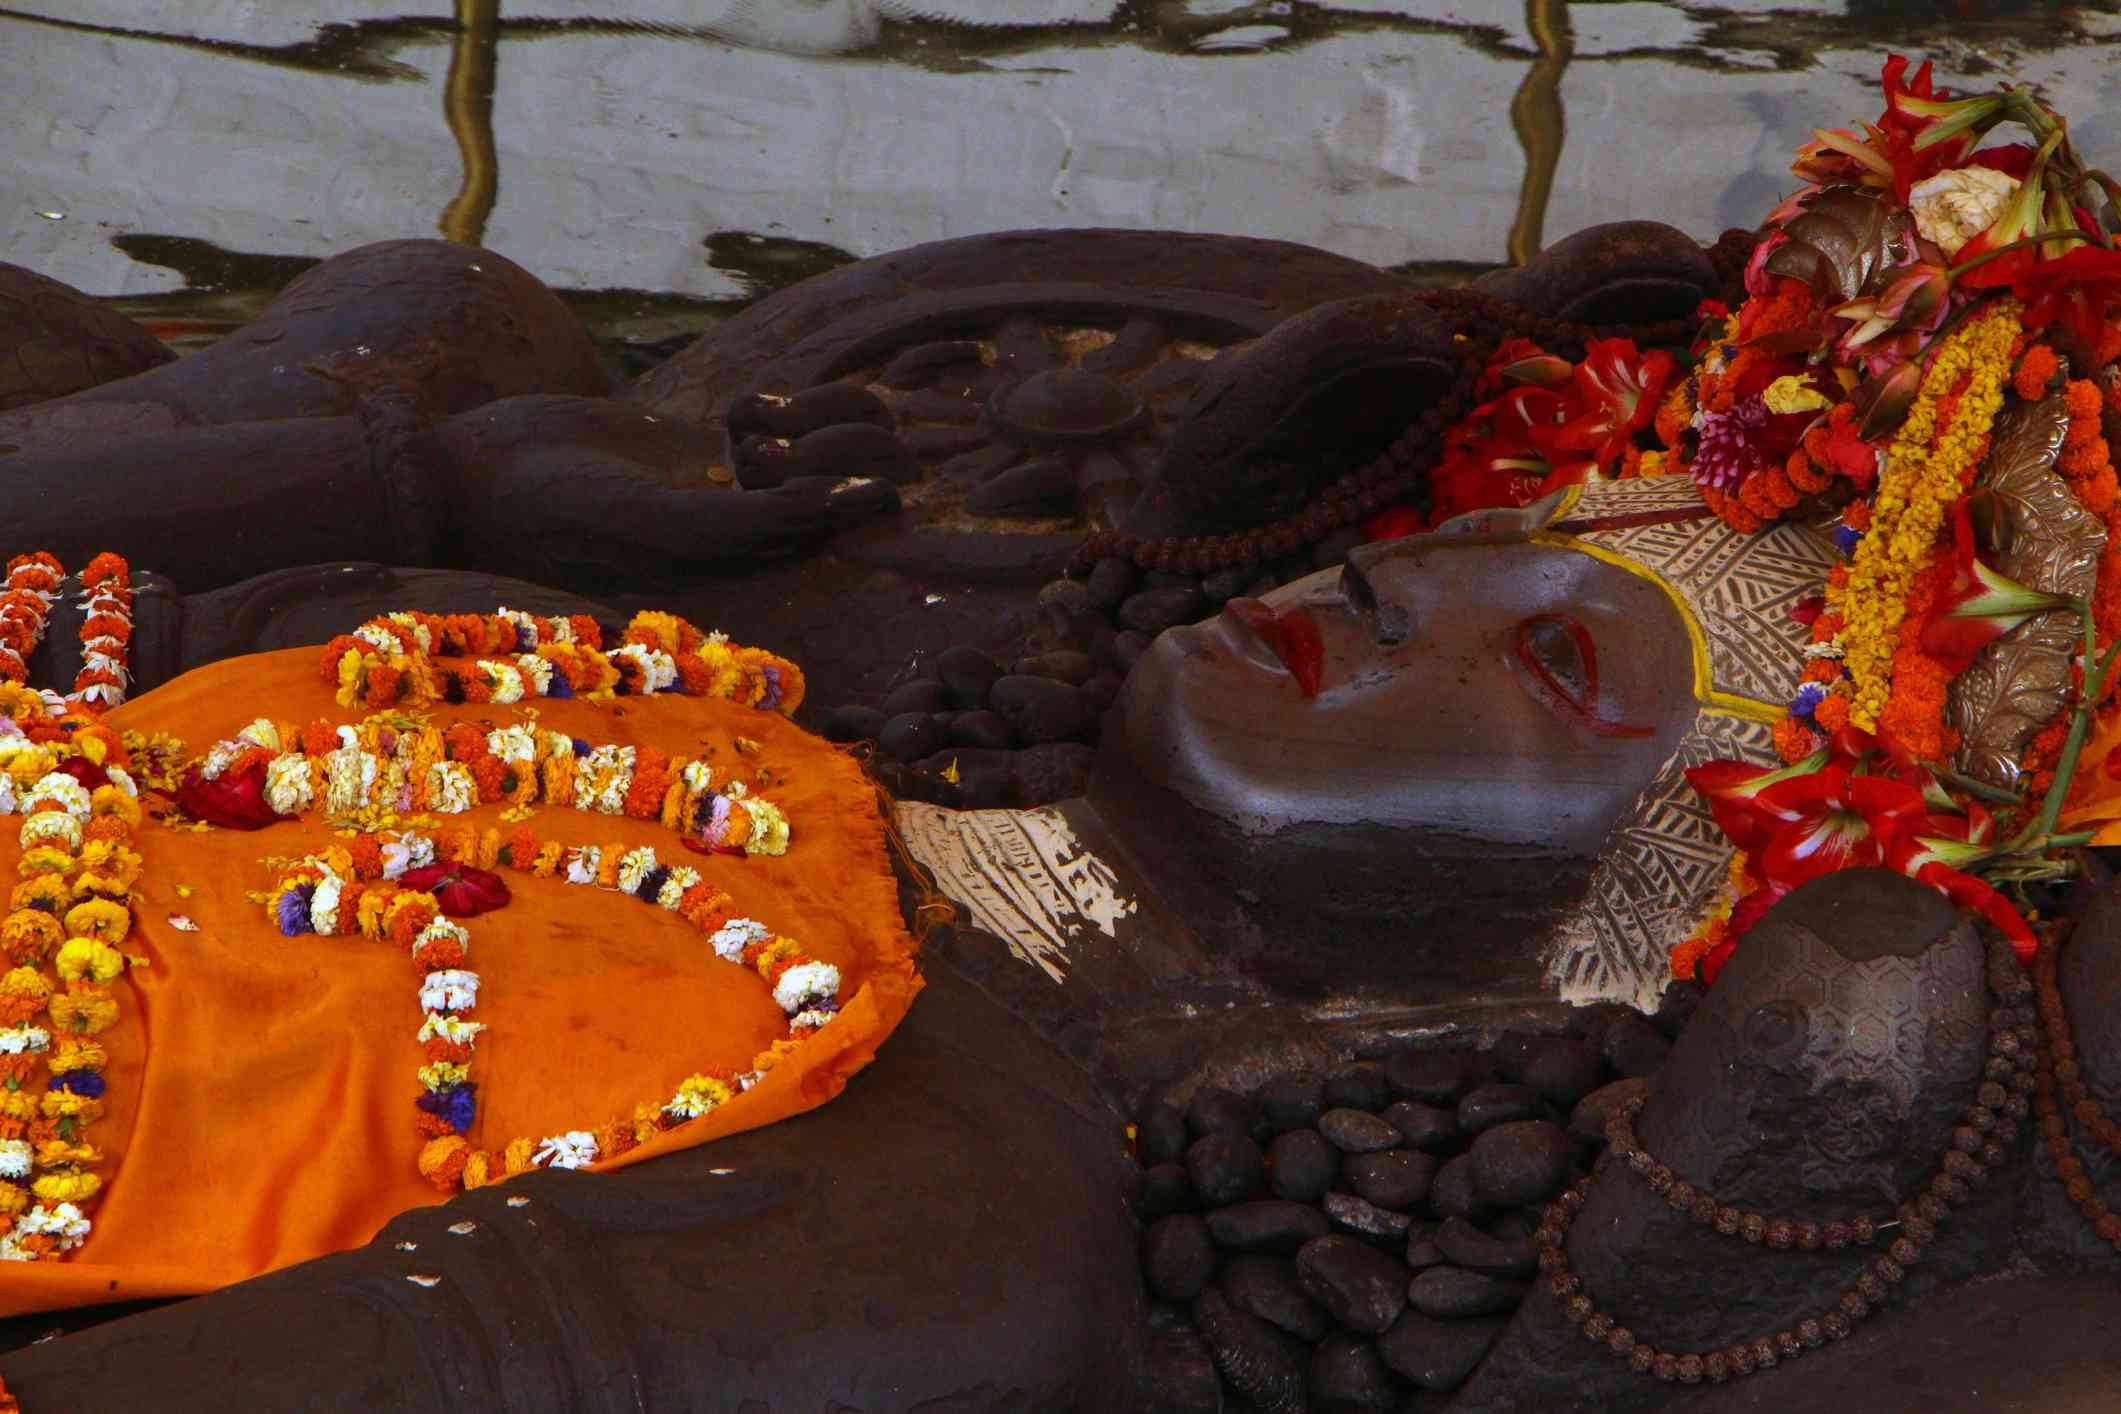 reclining statue of Hindu Lord Vishnu with orange marigold garlands